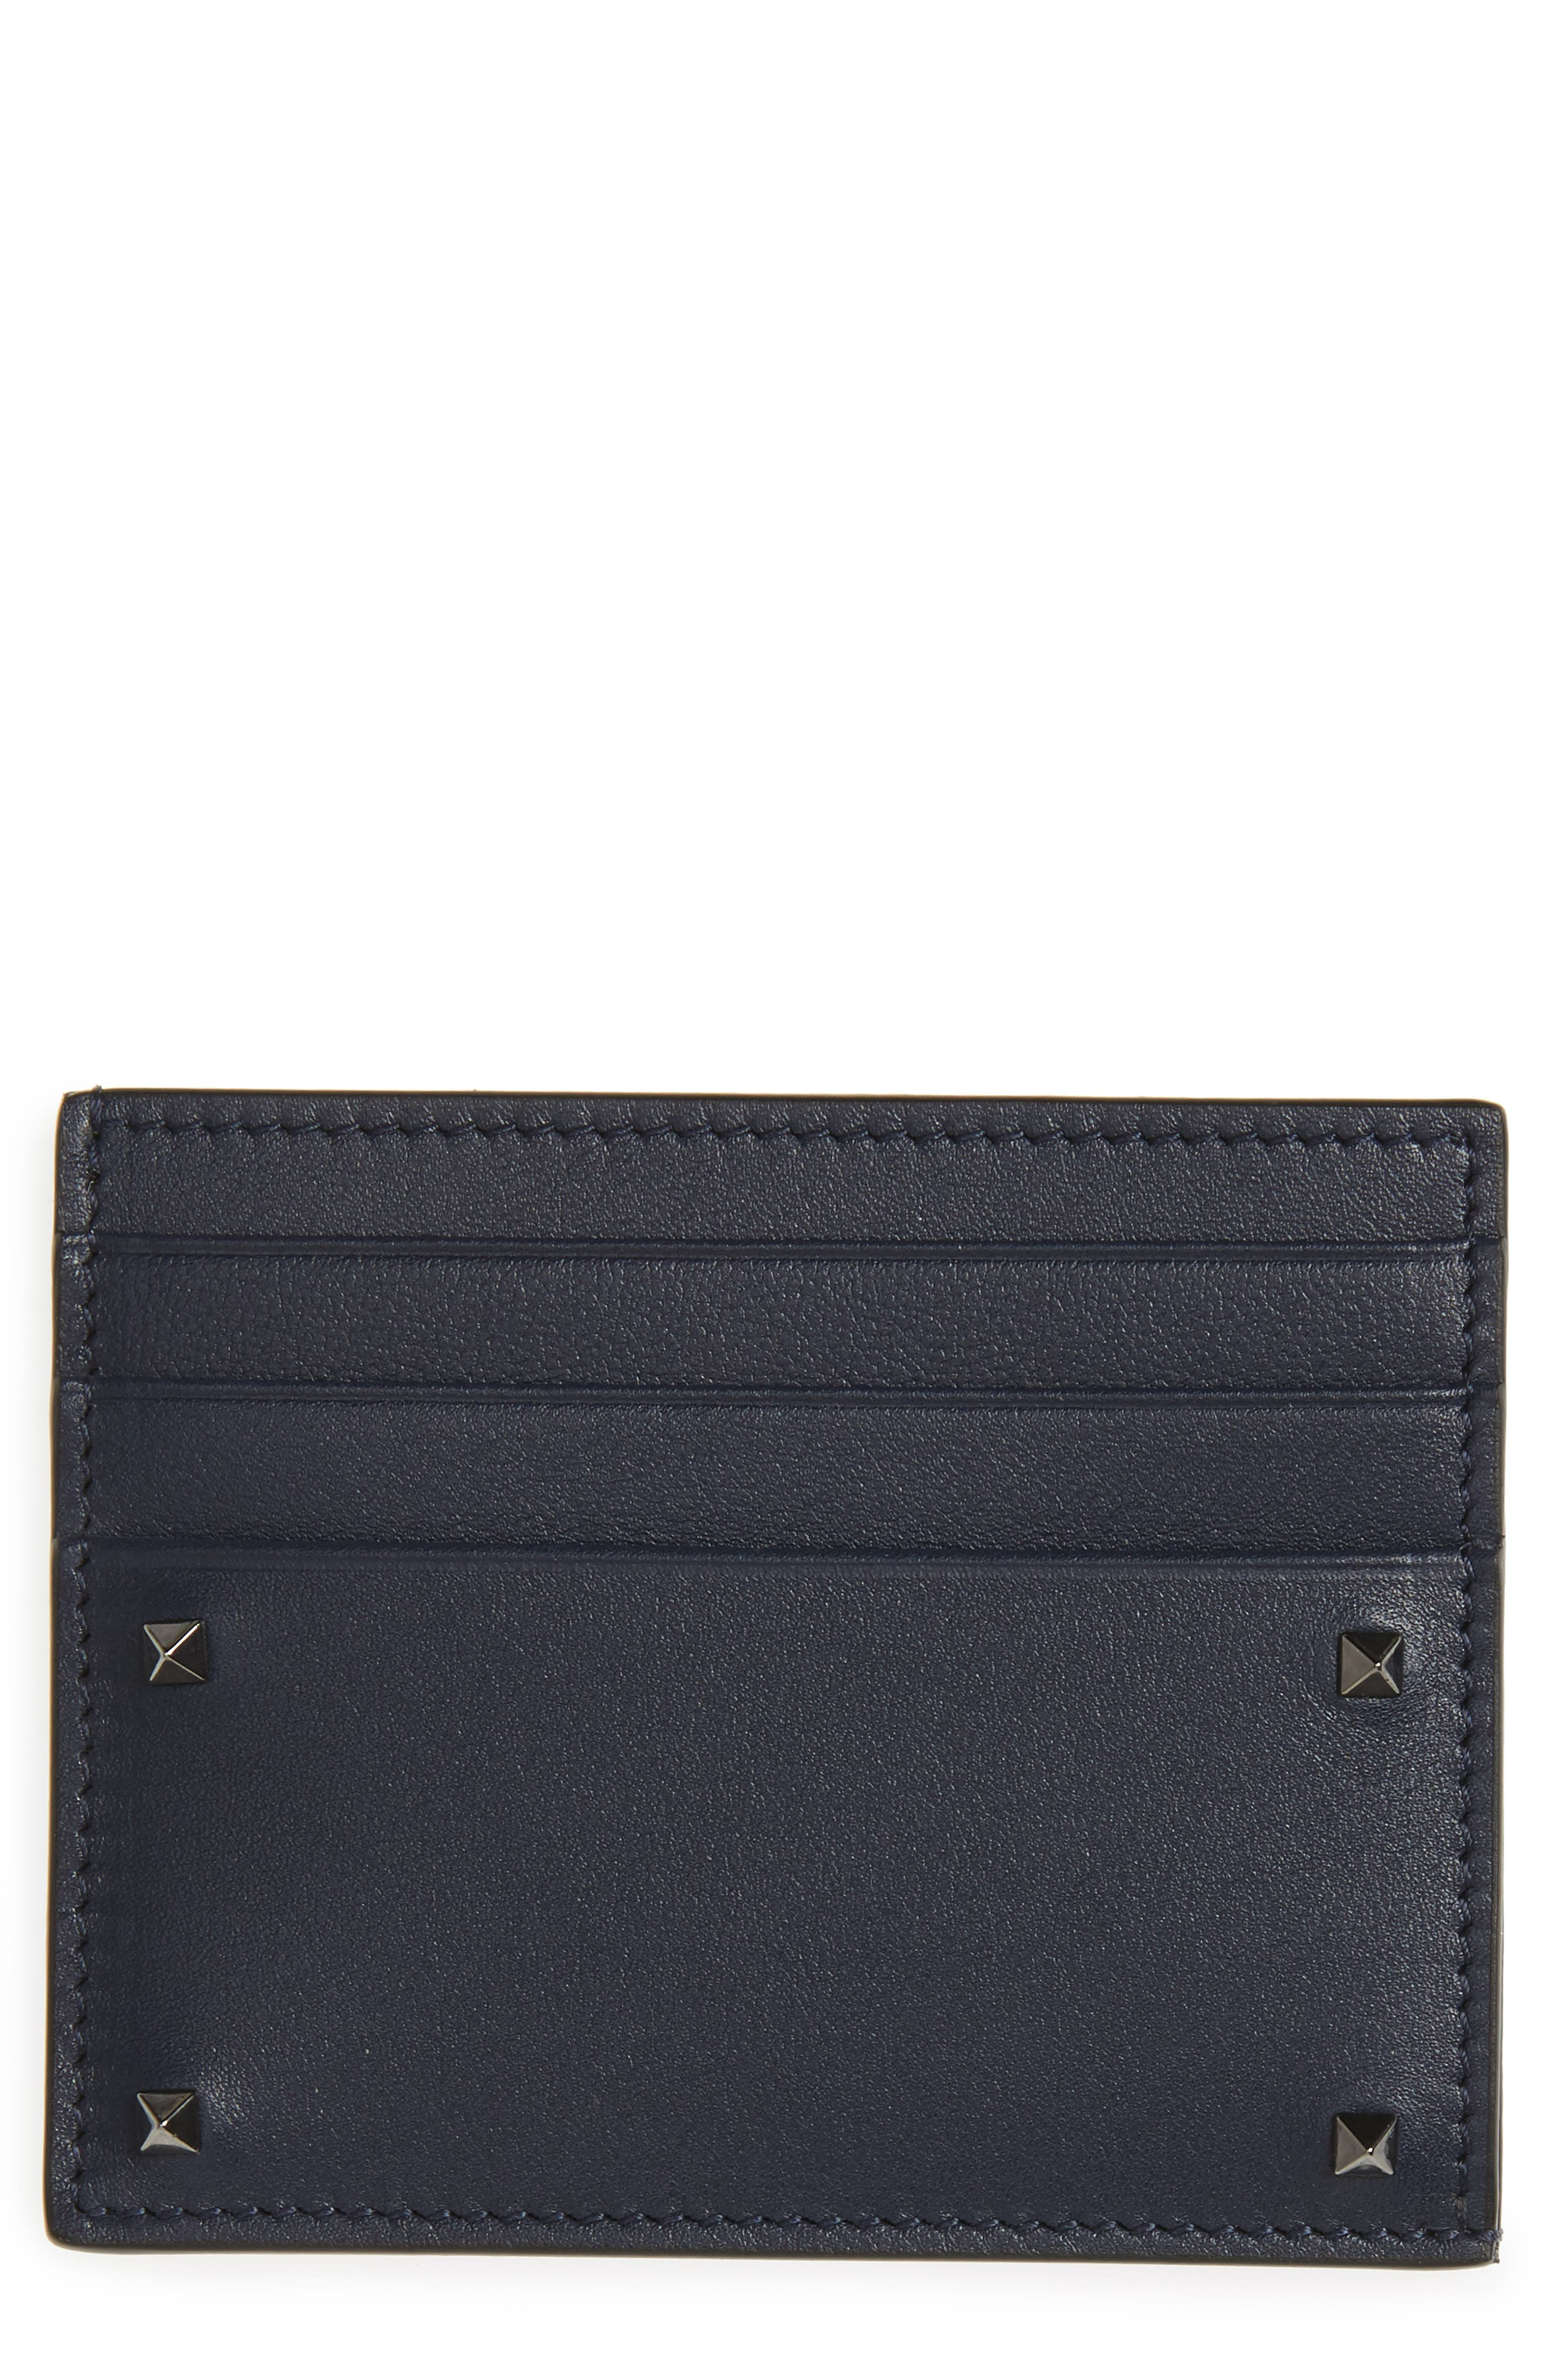 VALENTINO GARAVANI Mini Rock Stud Leather Card Case